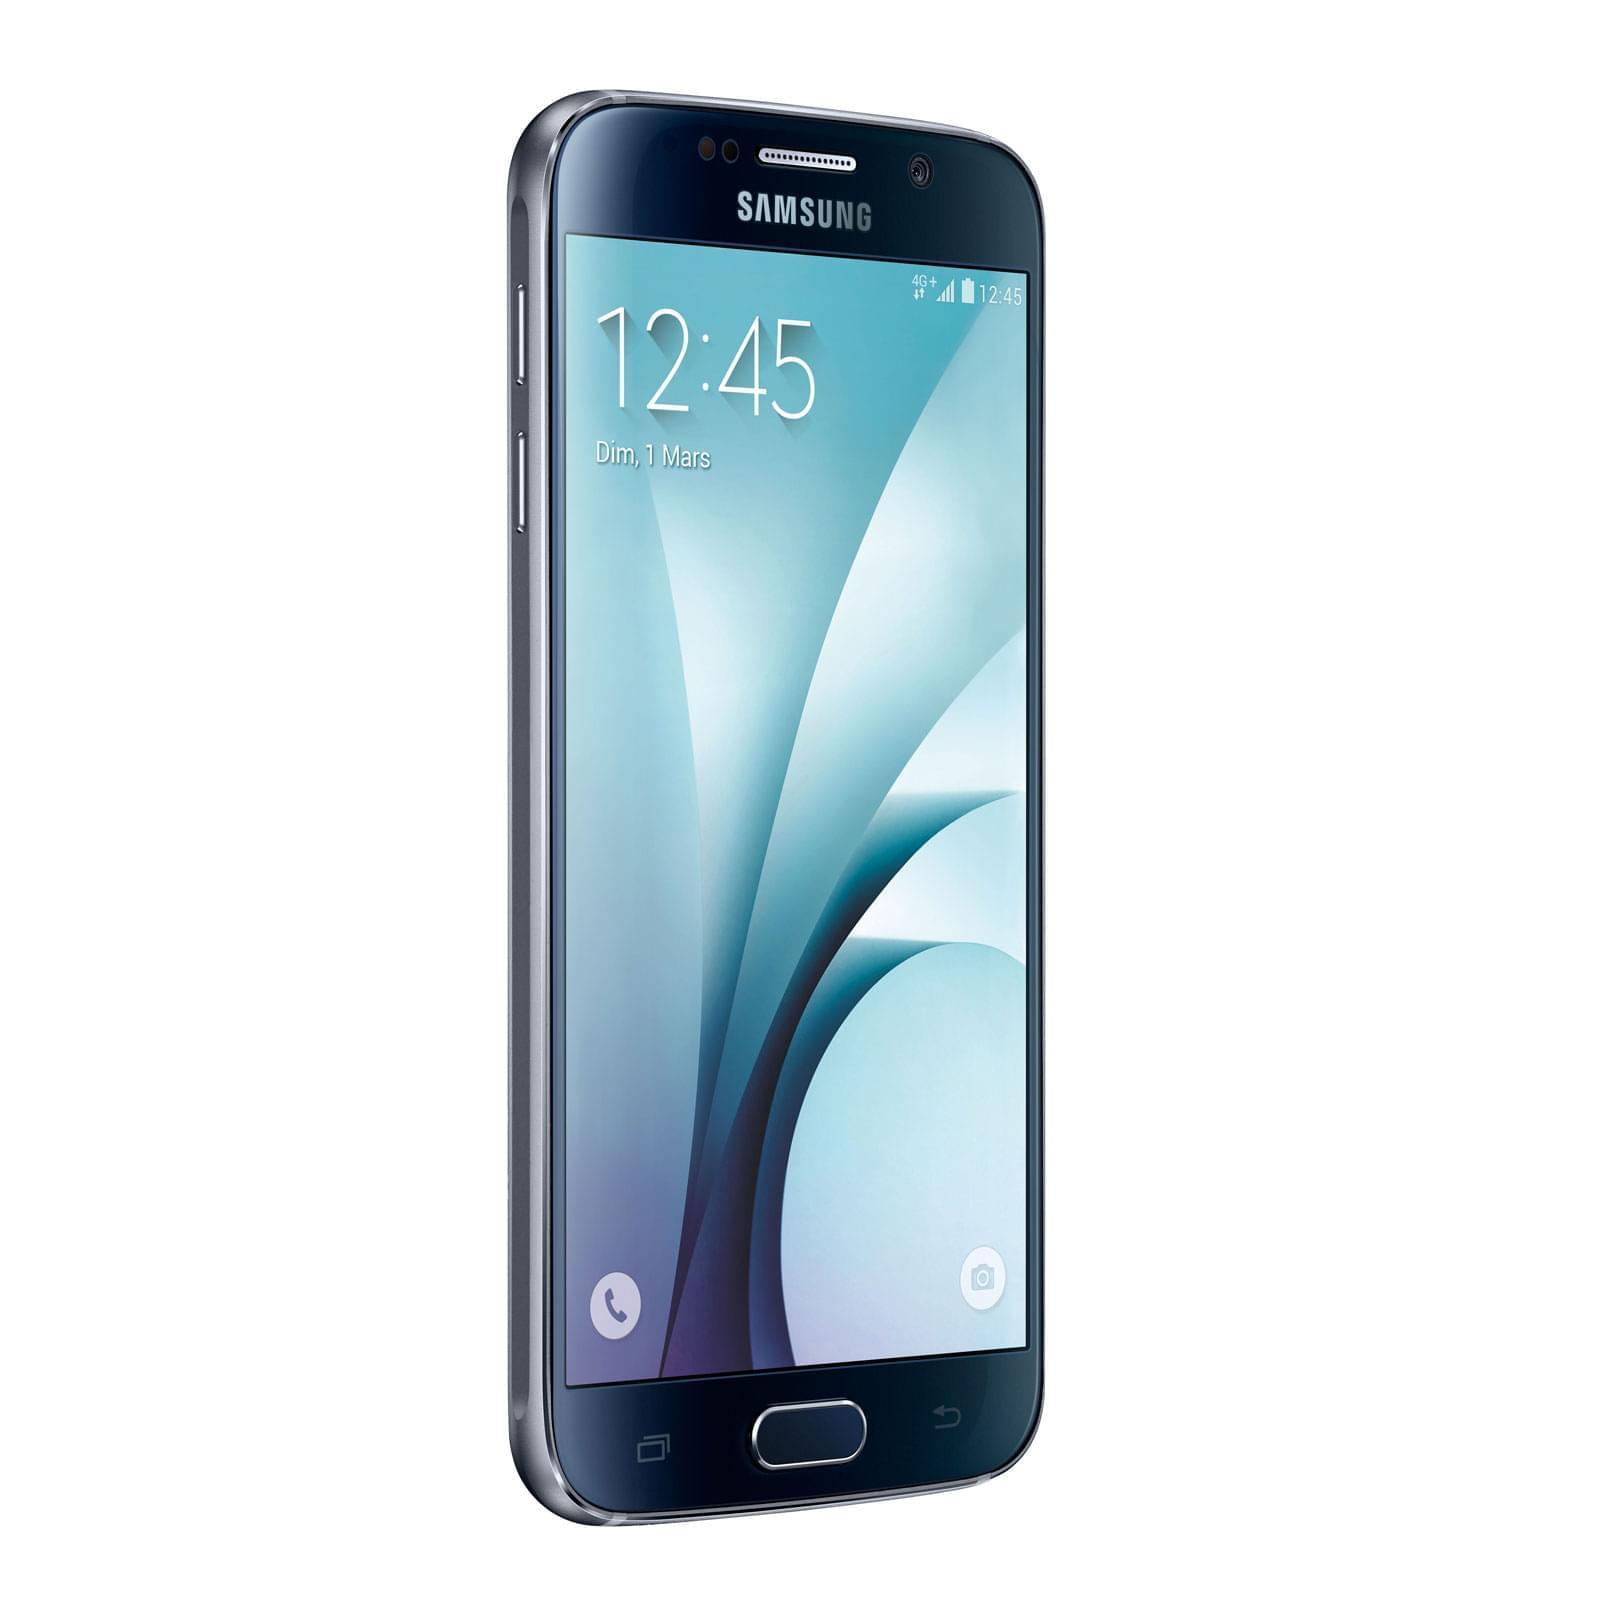 Samsung Galaxy S6 32Gb Black G920F (SM-G920FZKAXEF) - Achat / Vente Téléphonie sur Cybertek.fr - 0